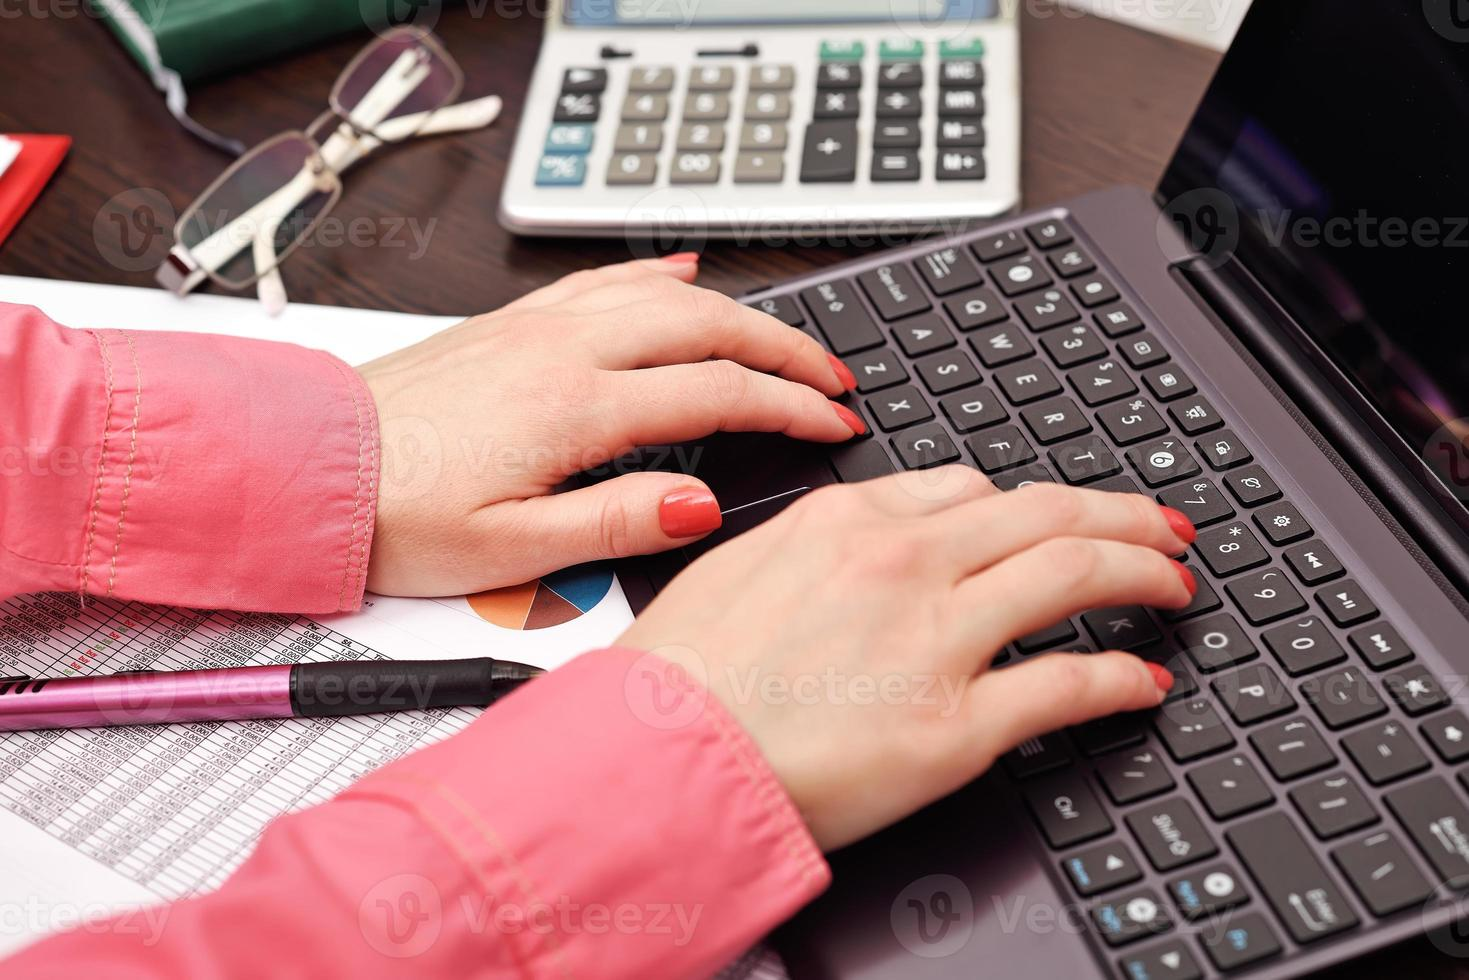 segretaria spingendo i pulsanti del laptop foto